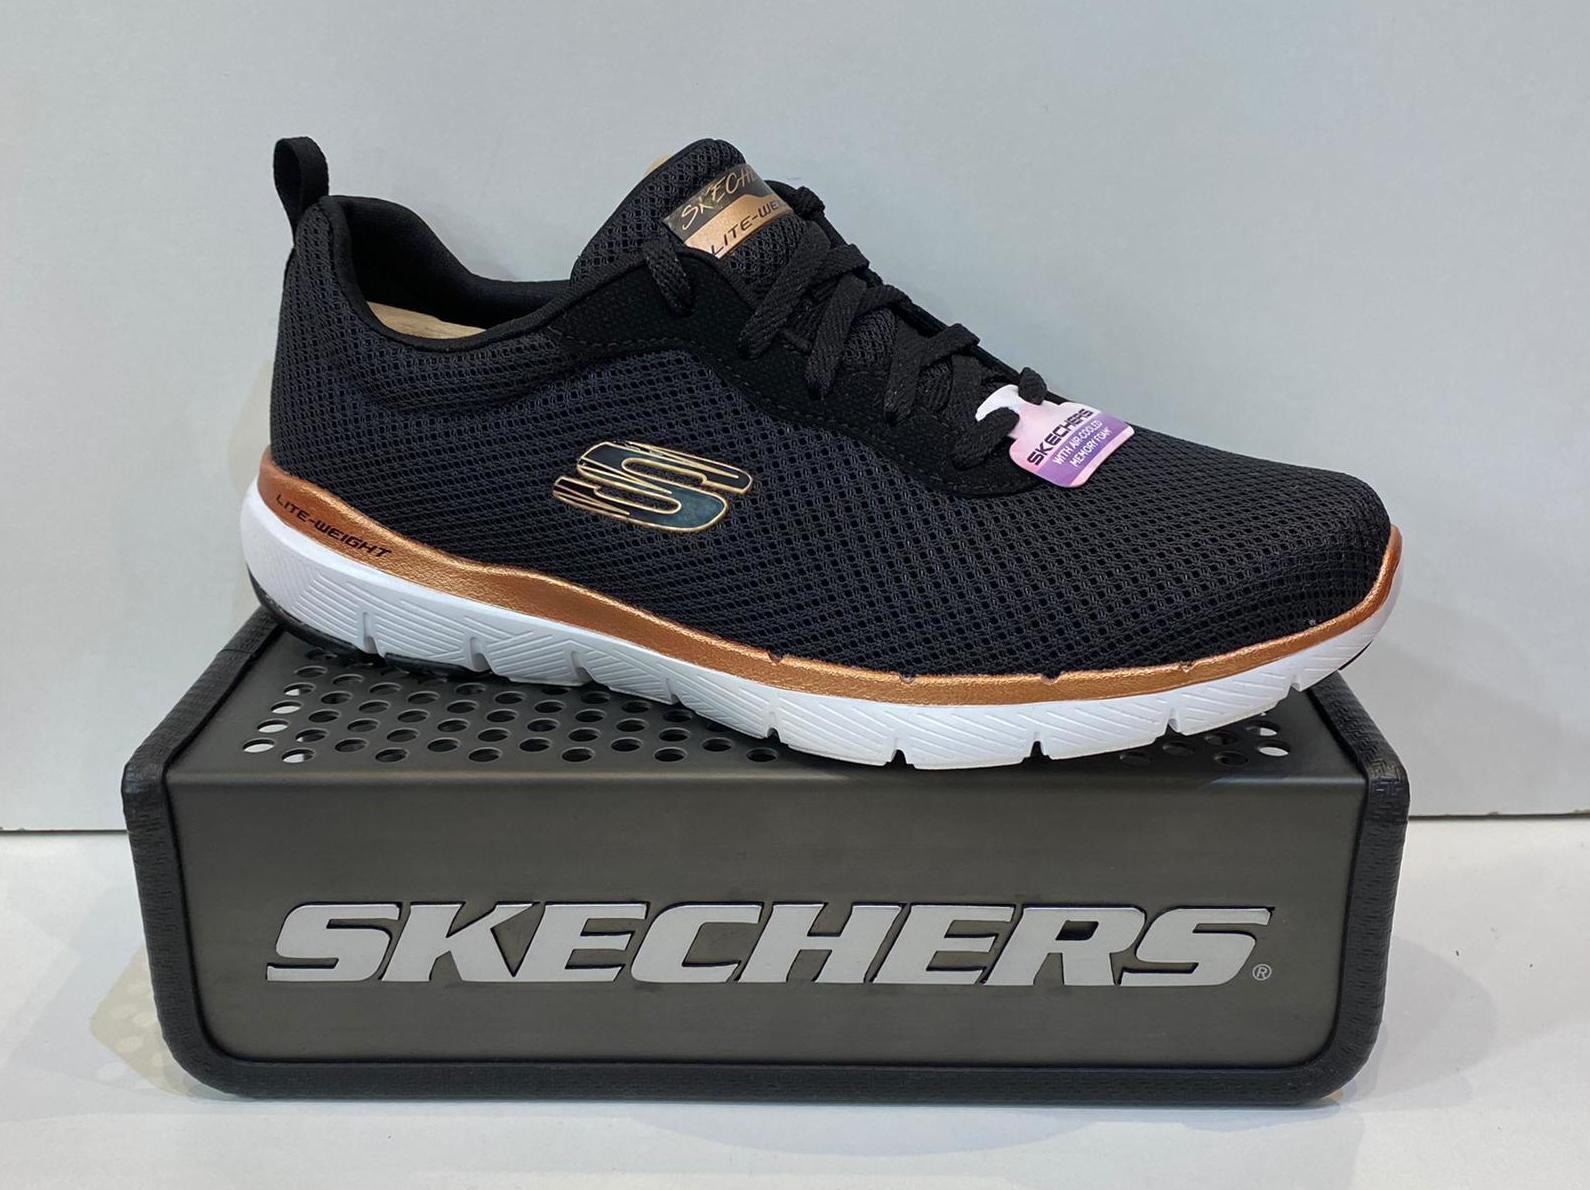 Sabata esportiva de dona, de la marca Skechers, sola de resalite, plantilla memory foam Air Colled 59.95€